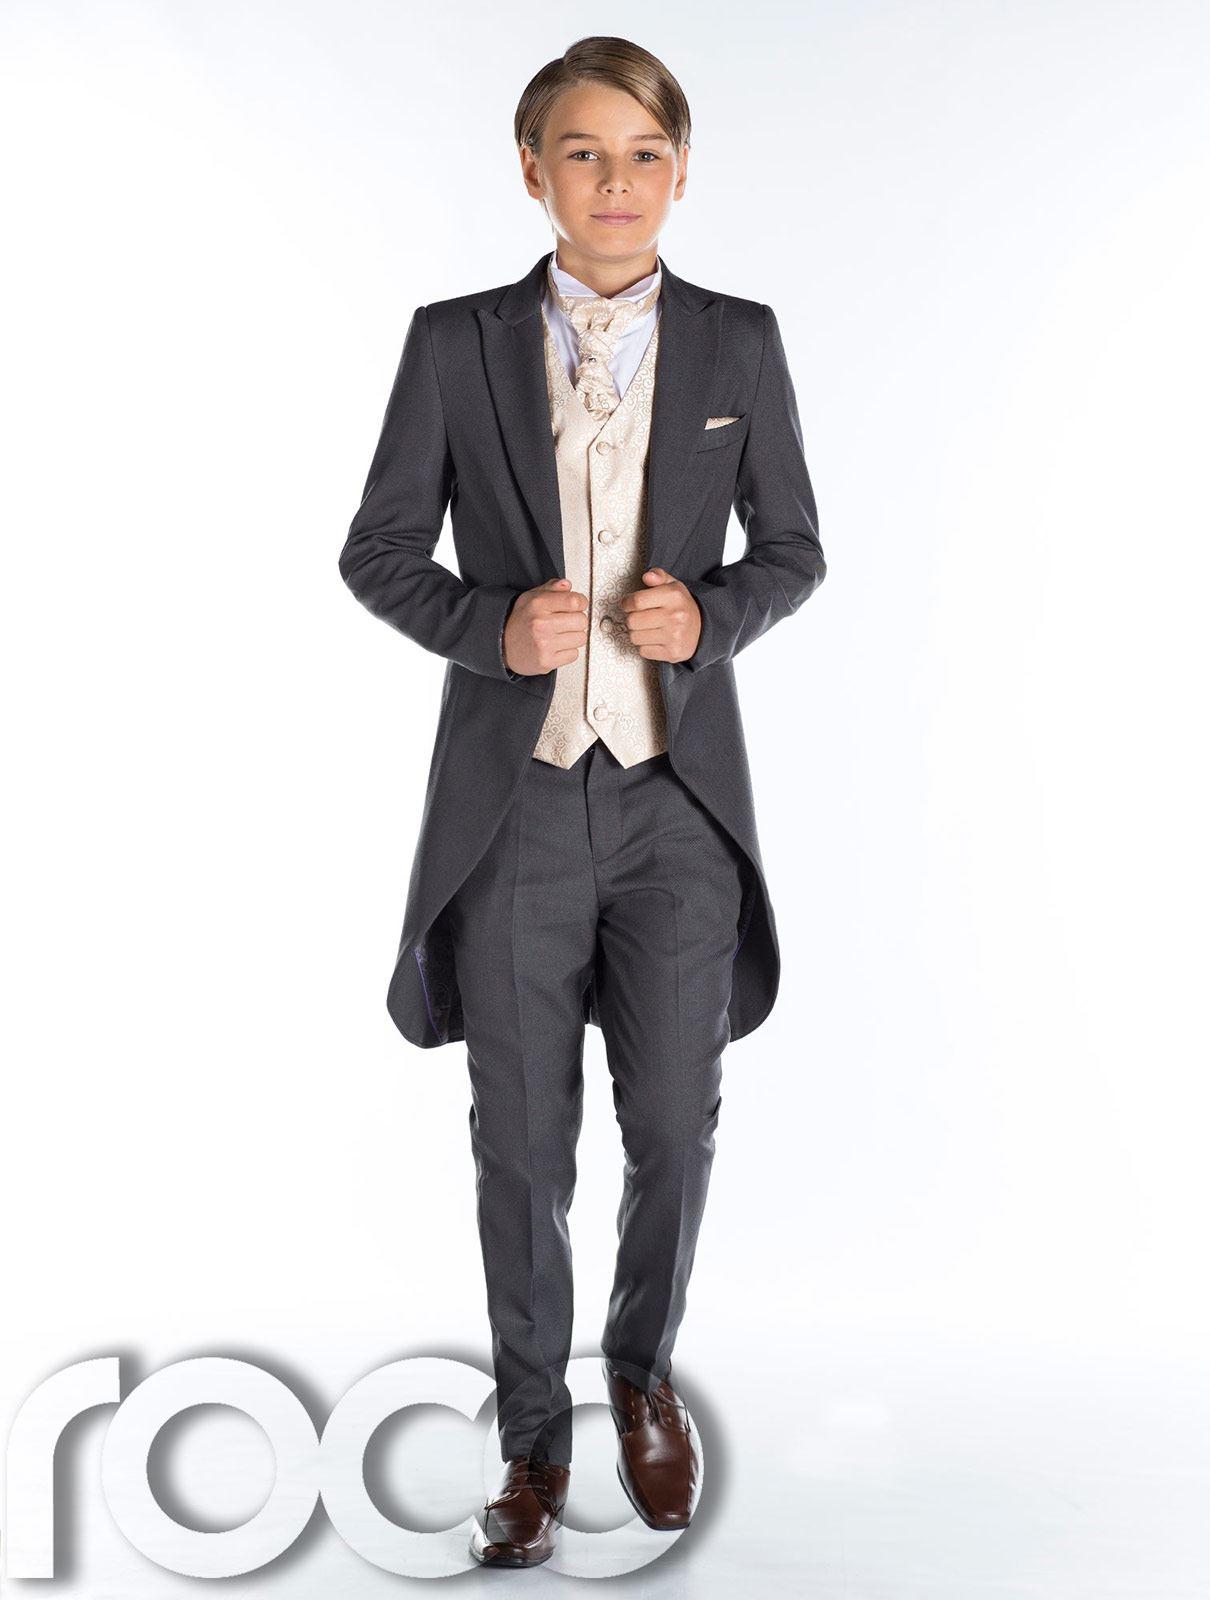 Grau Frack Anzug Jungen Hochzeit Outfits Promanzug